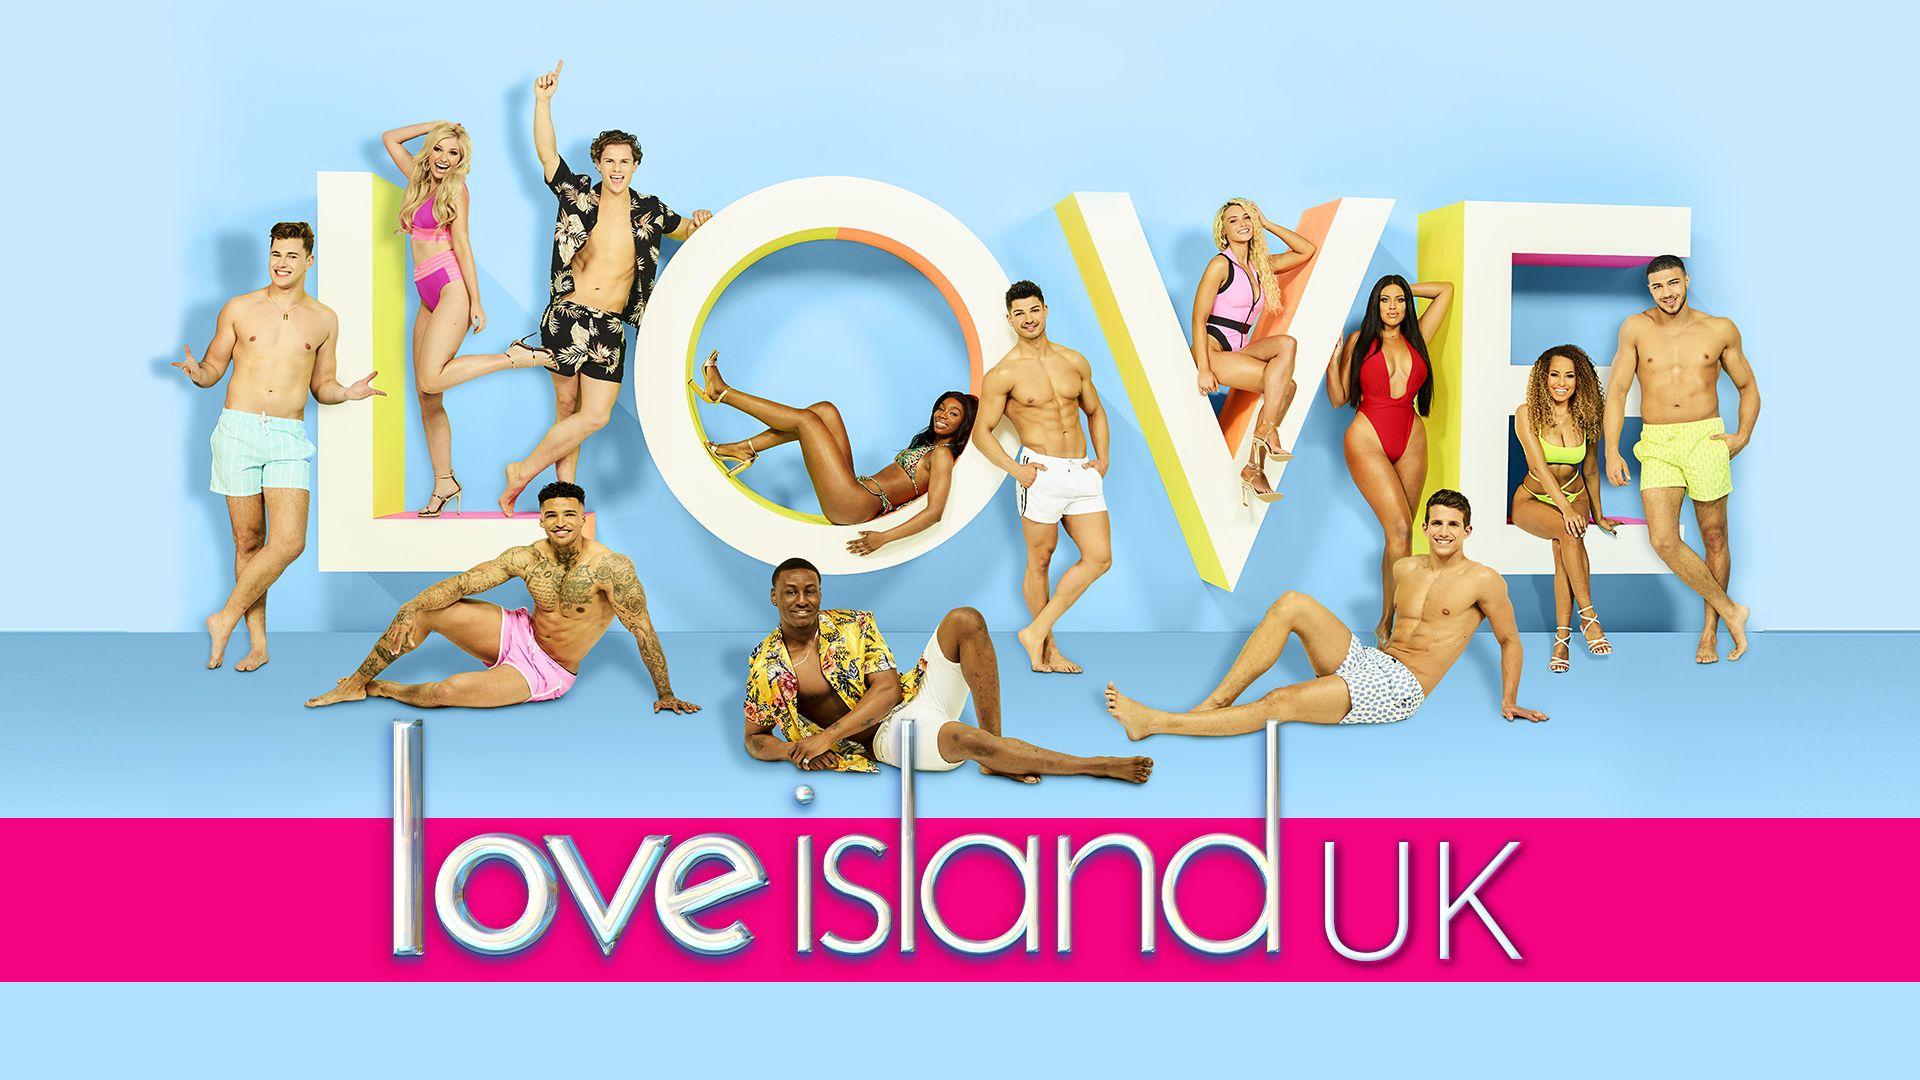 love island uk videoland